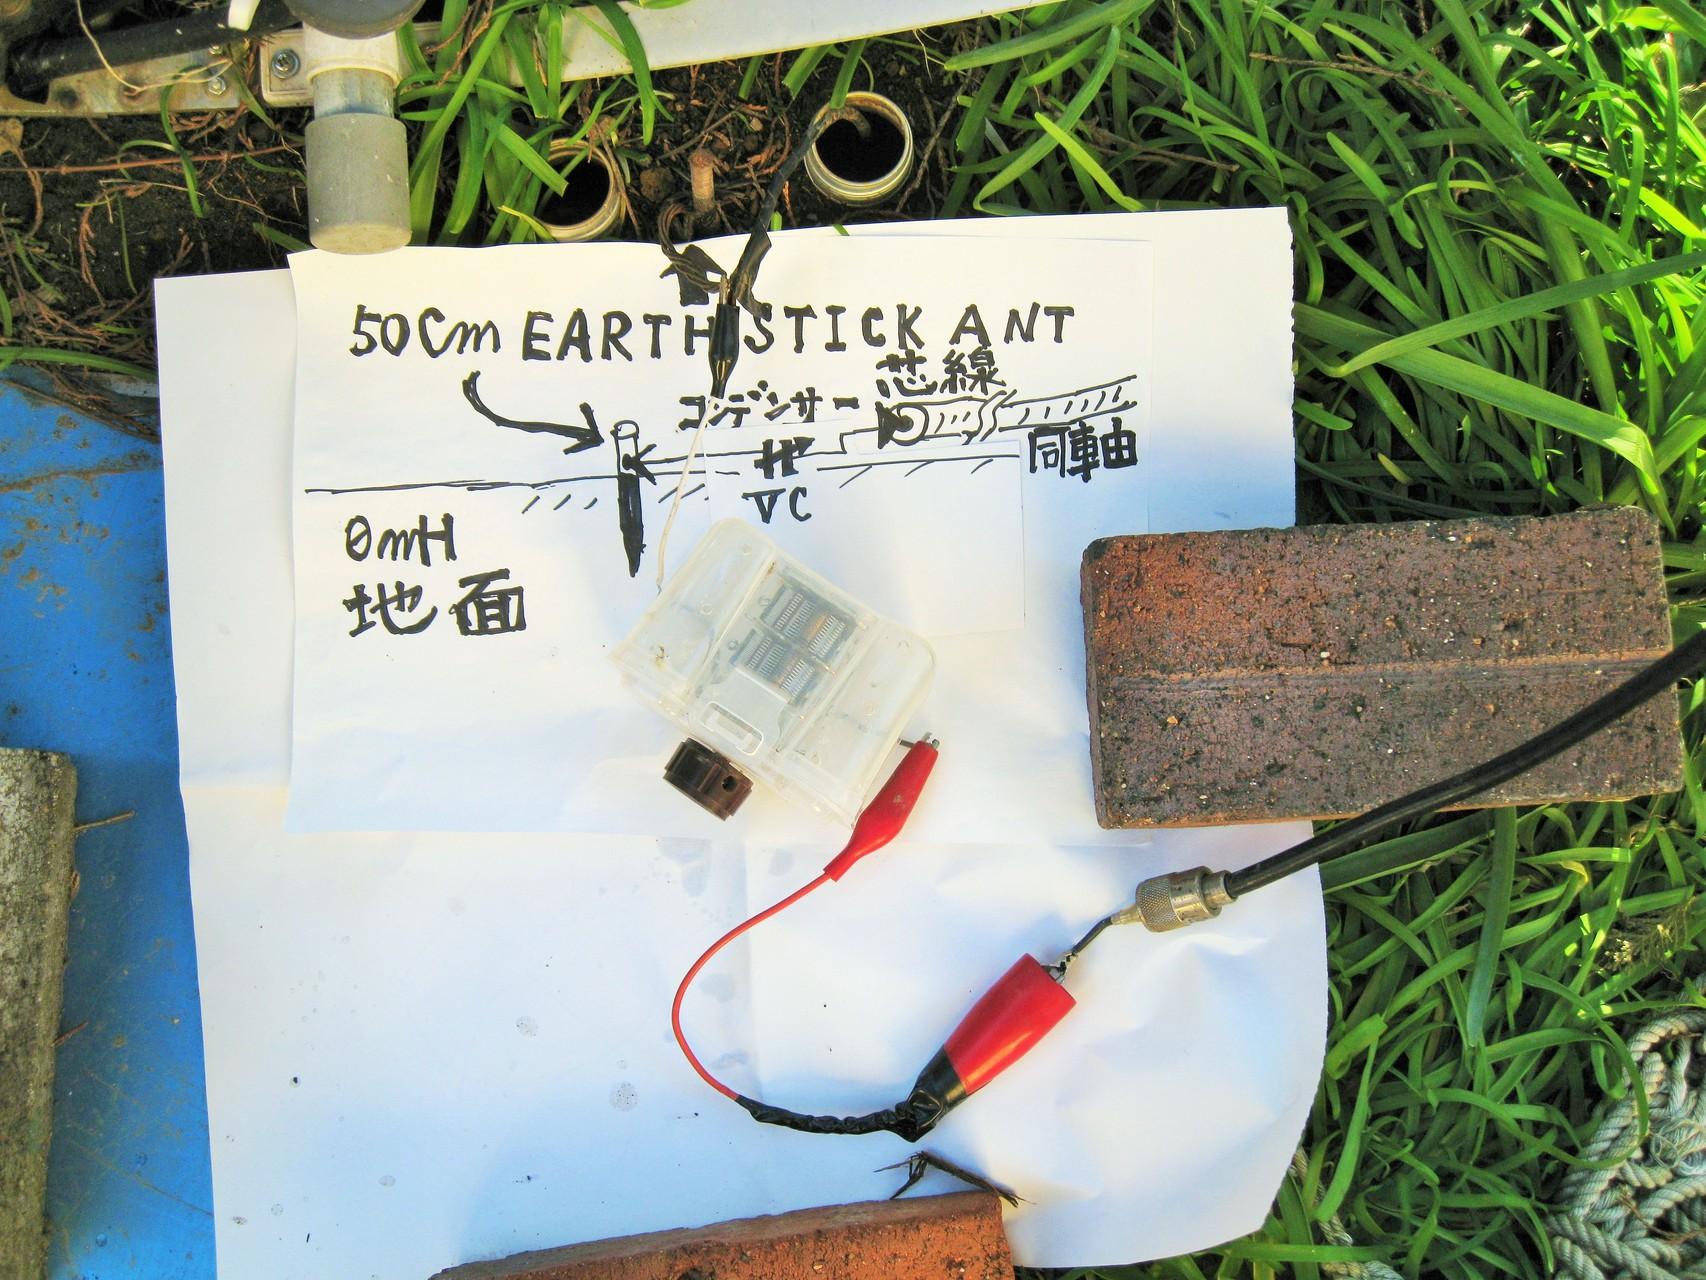 15m5D-FB給電同軸先端芯線にVC(可変容量コンデンサー)を直列接続して50cm Stick EATHへ給電